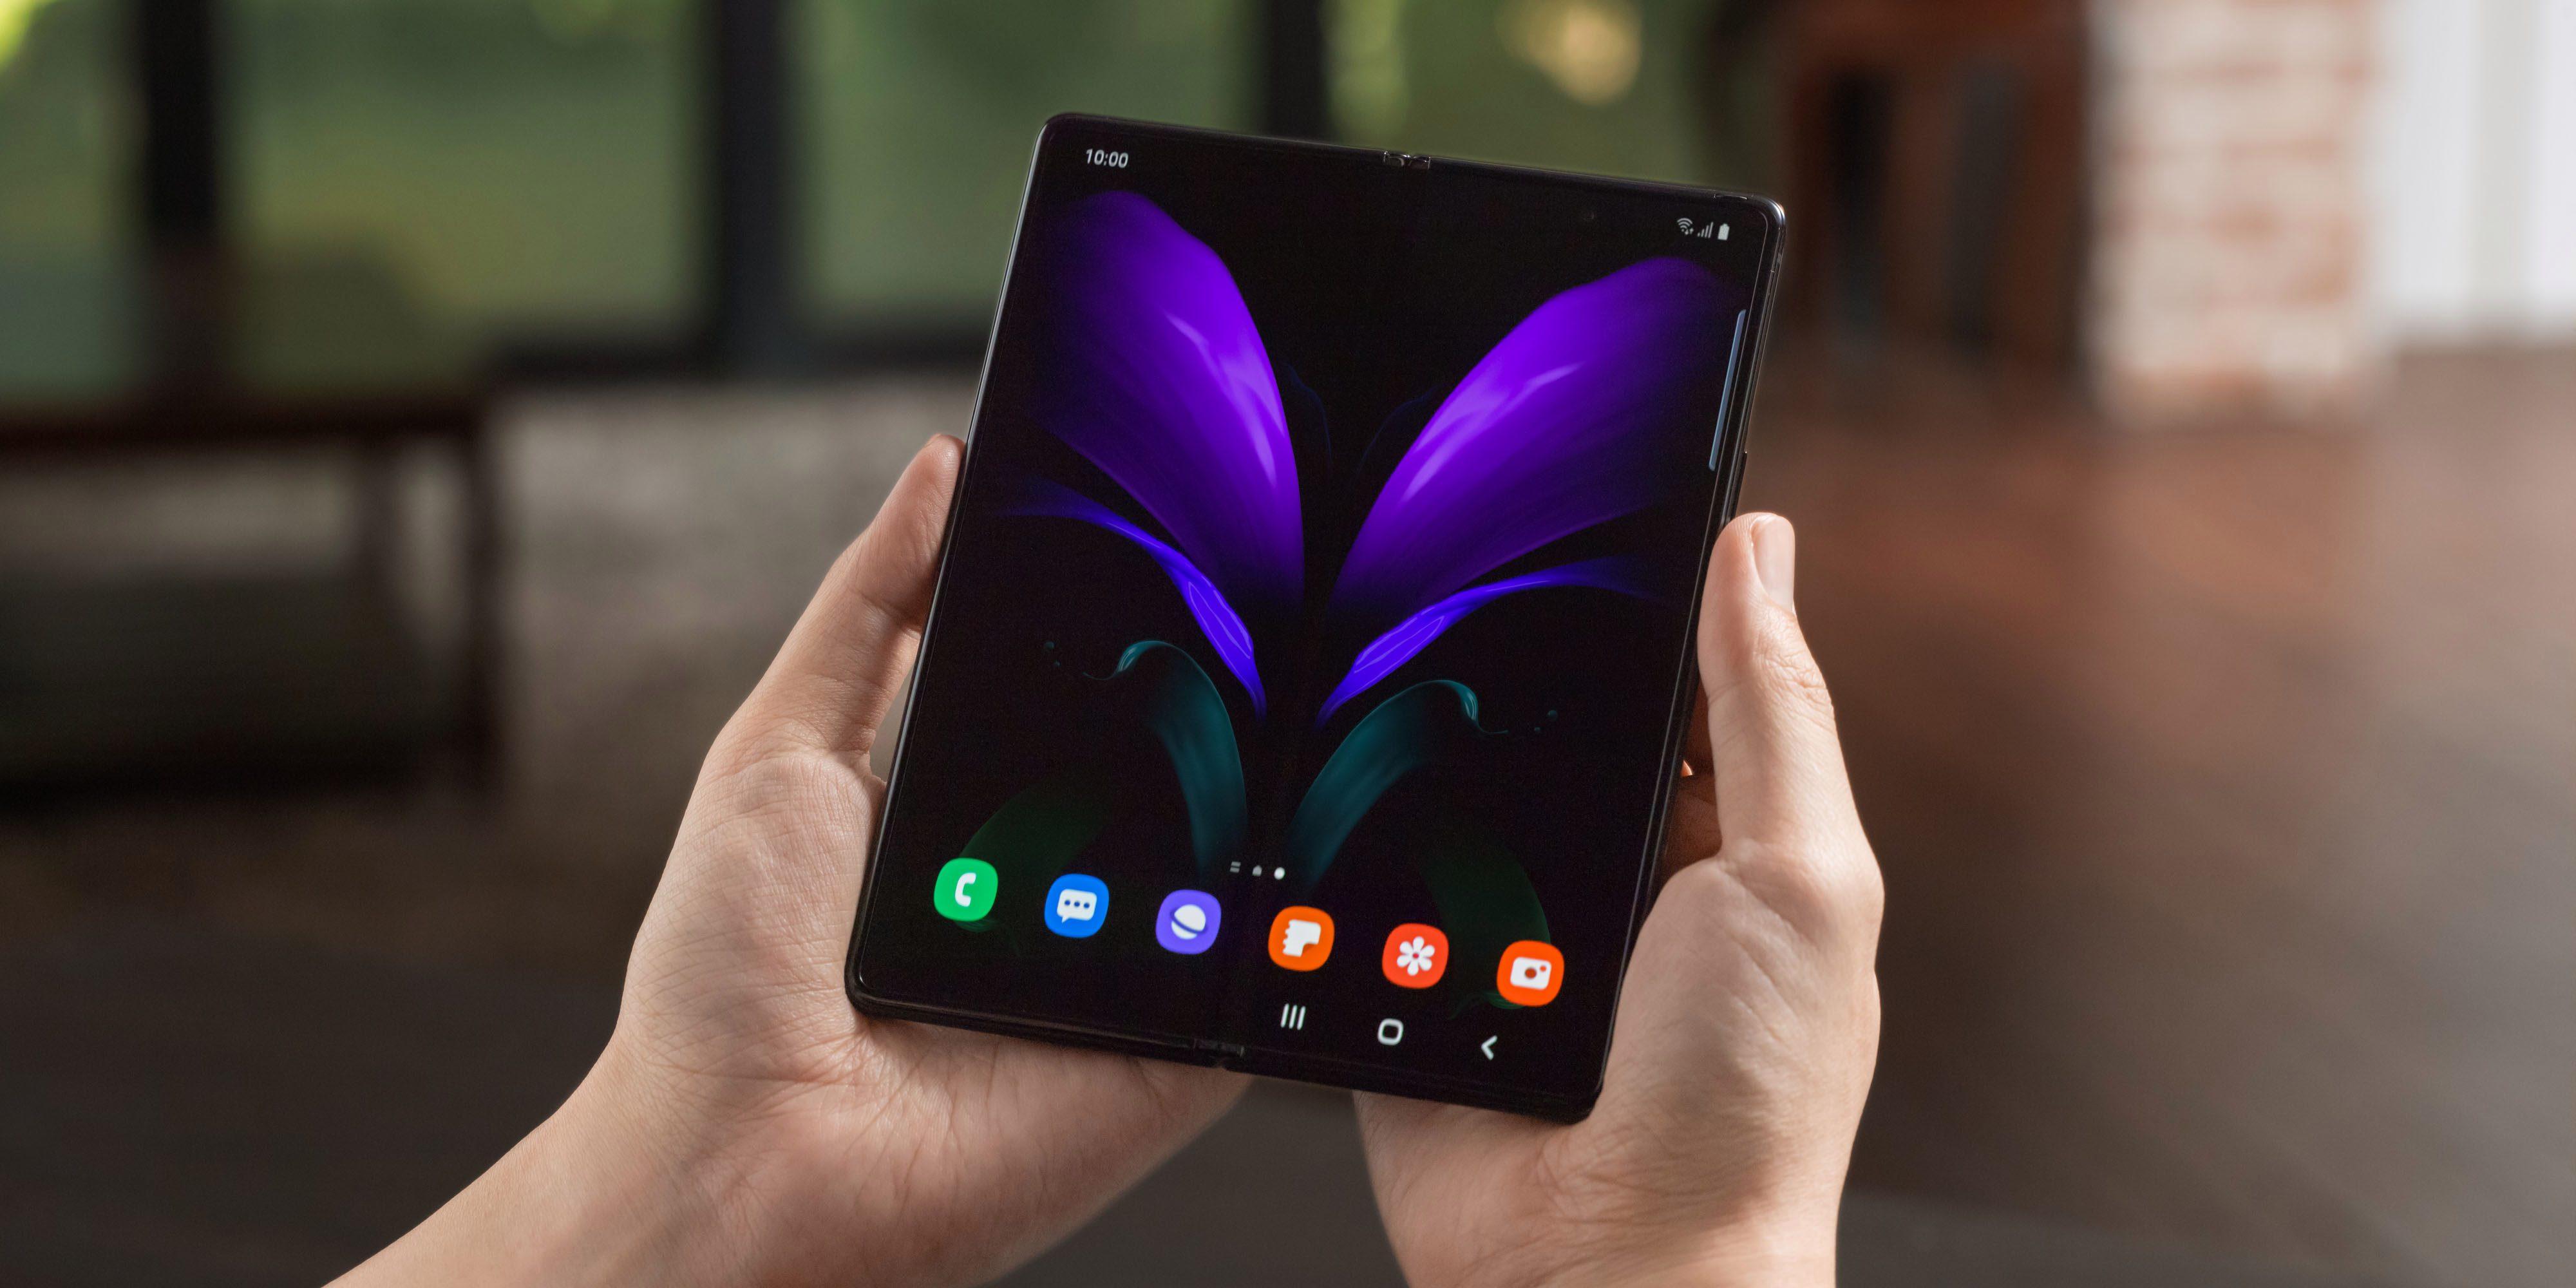 Складной смартфон Samsung Galaxy Z Fold 2 начал обновляться до Android 11